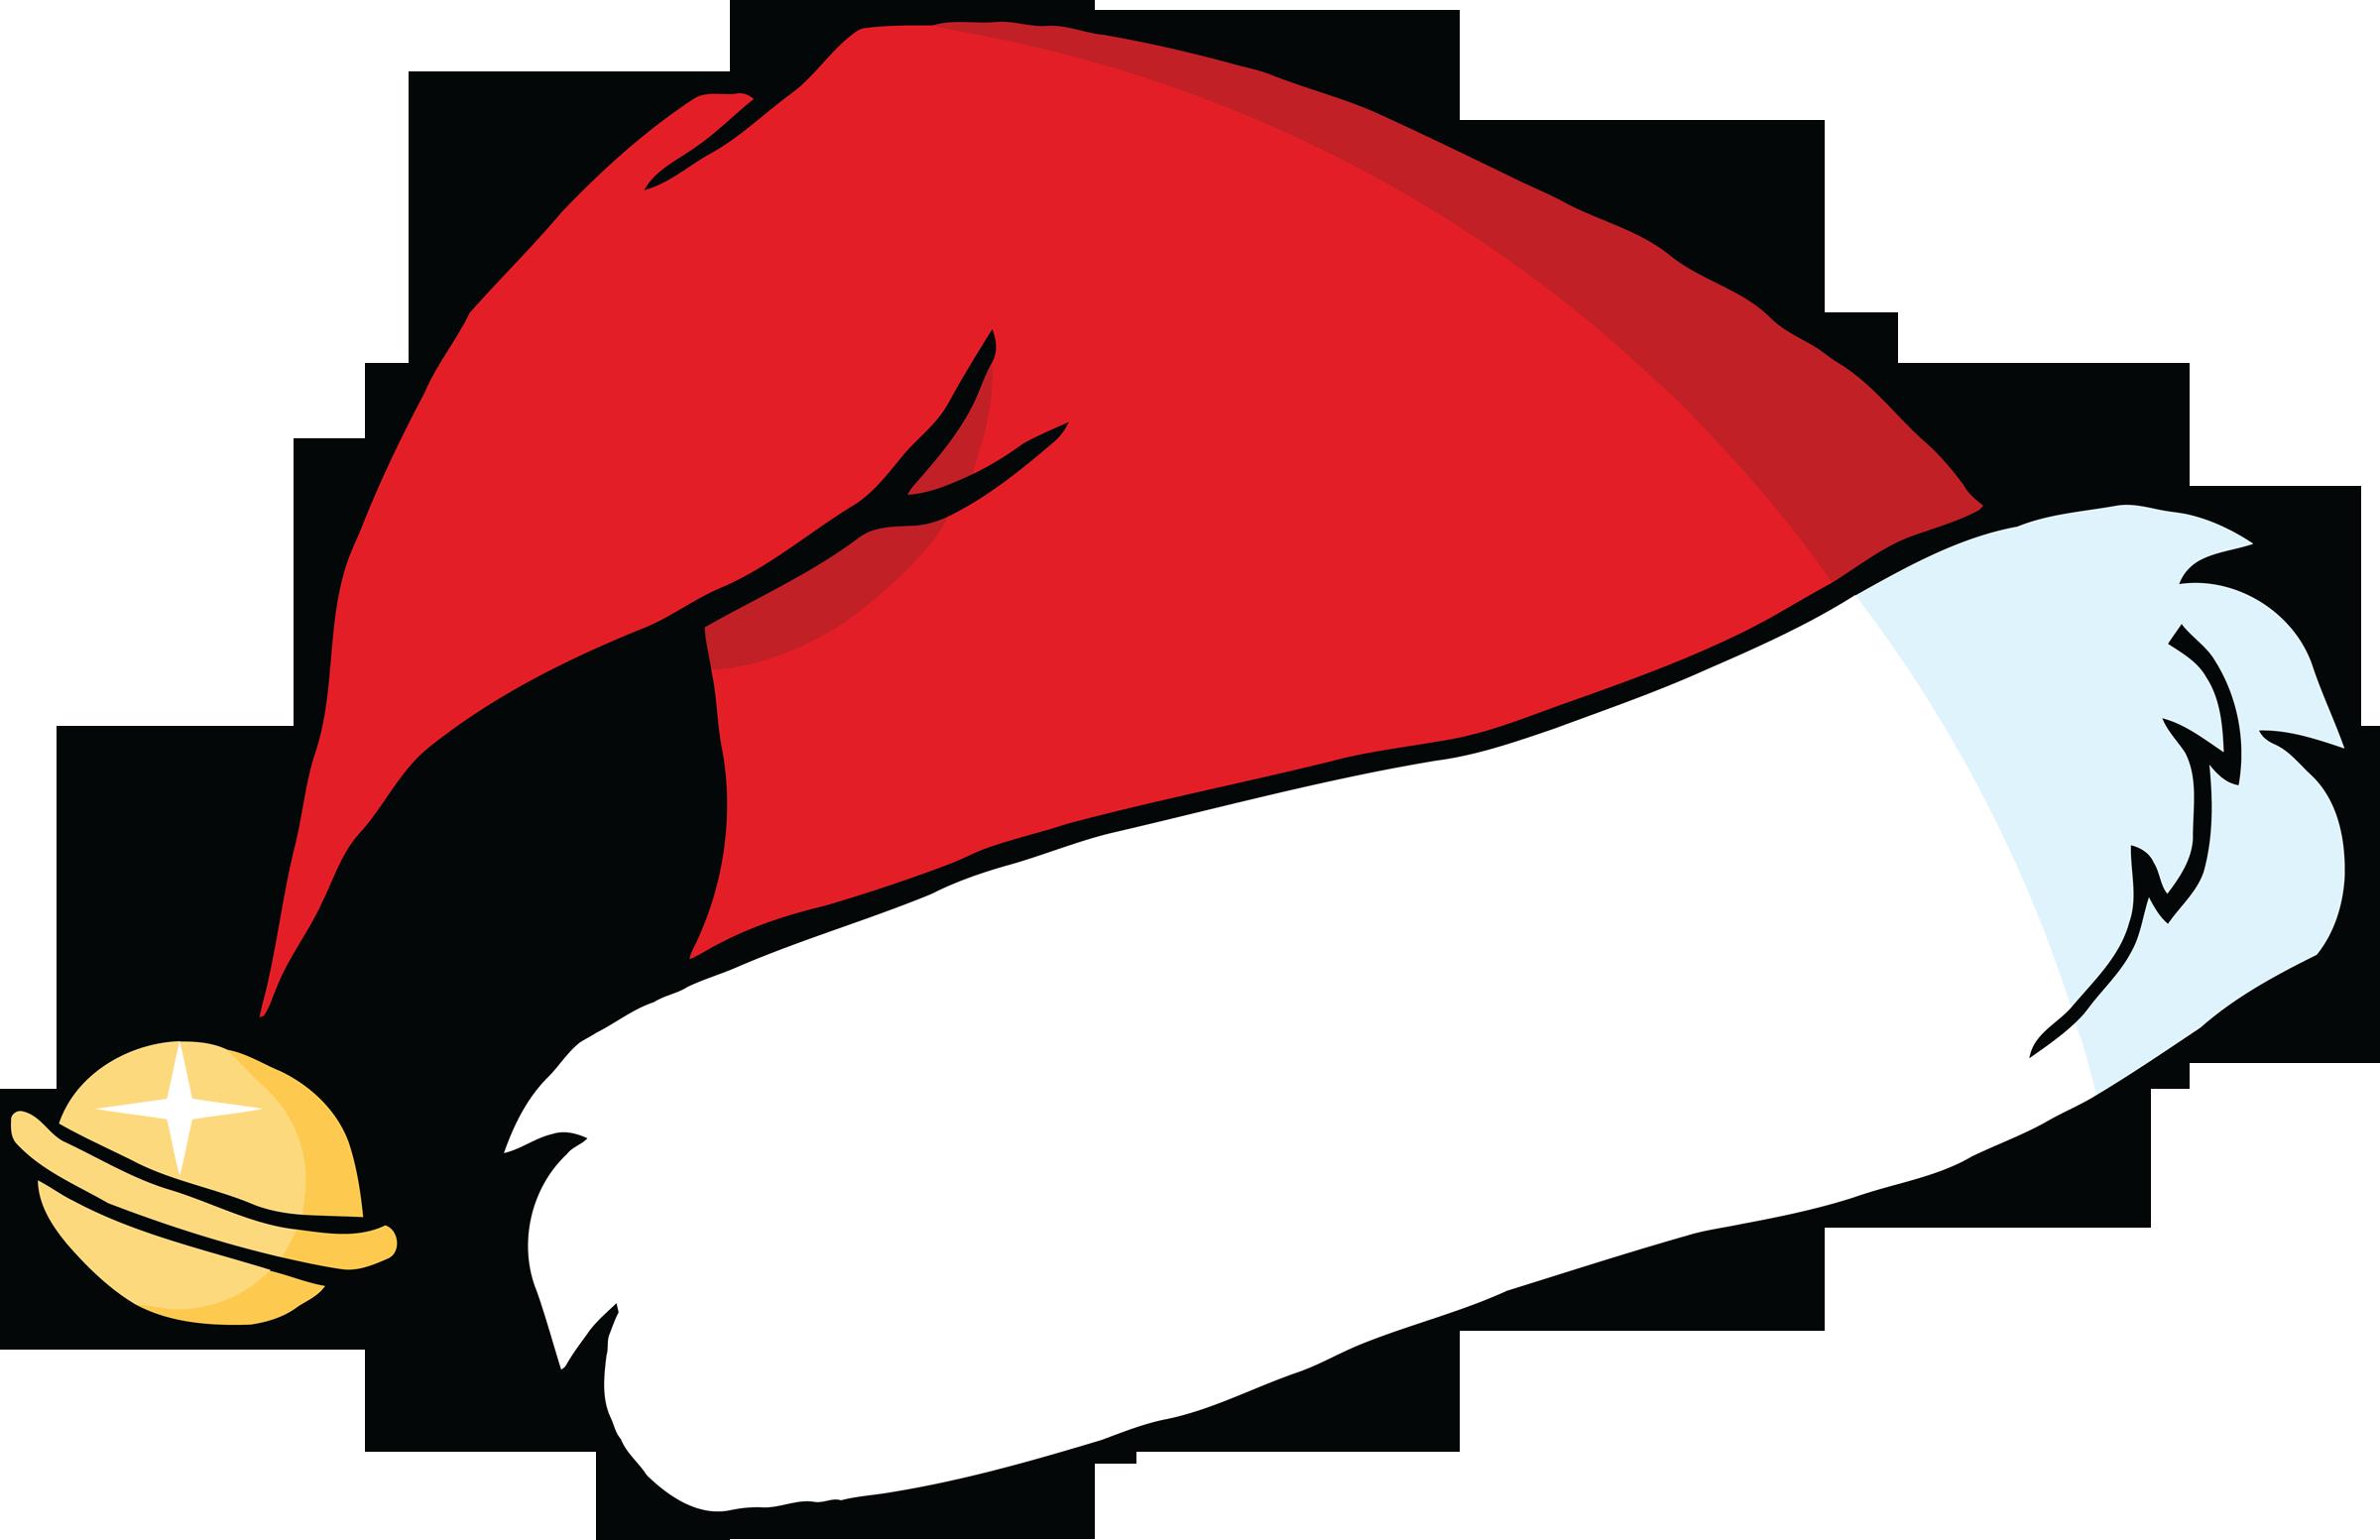 Black and white cartoon baseball cap clipart clipart free library Santa hat clipart mint - ClipartFox clipart free library